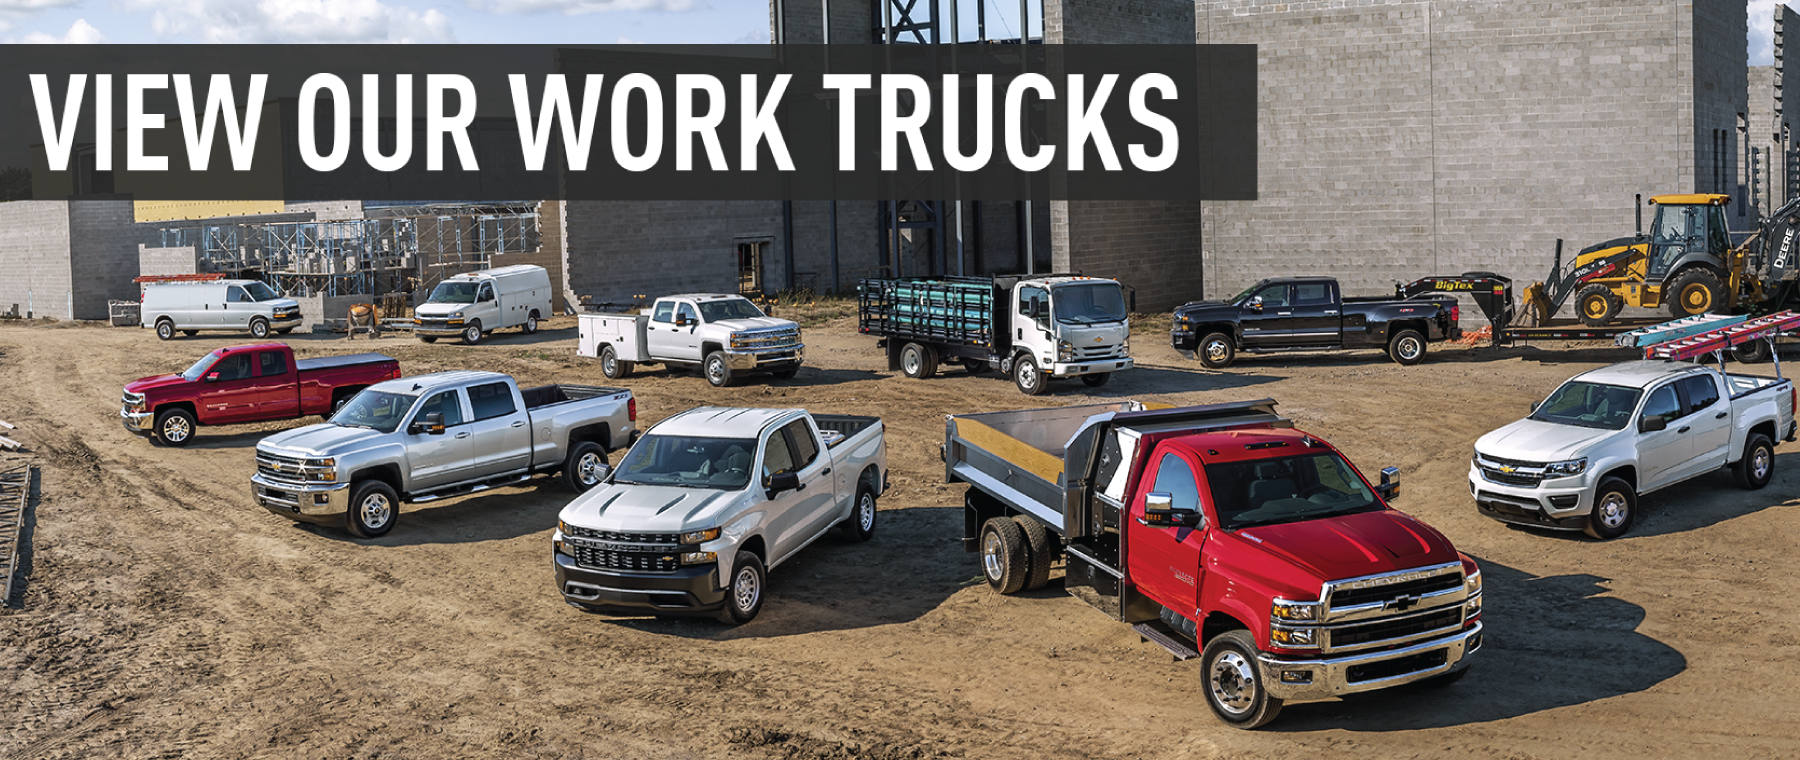 Work-Trucks